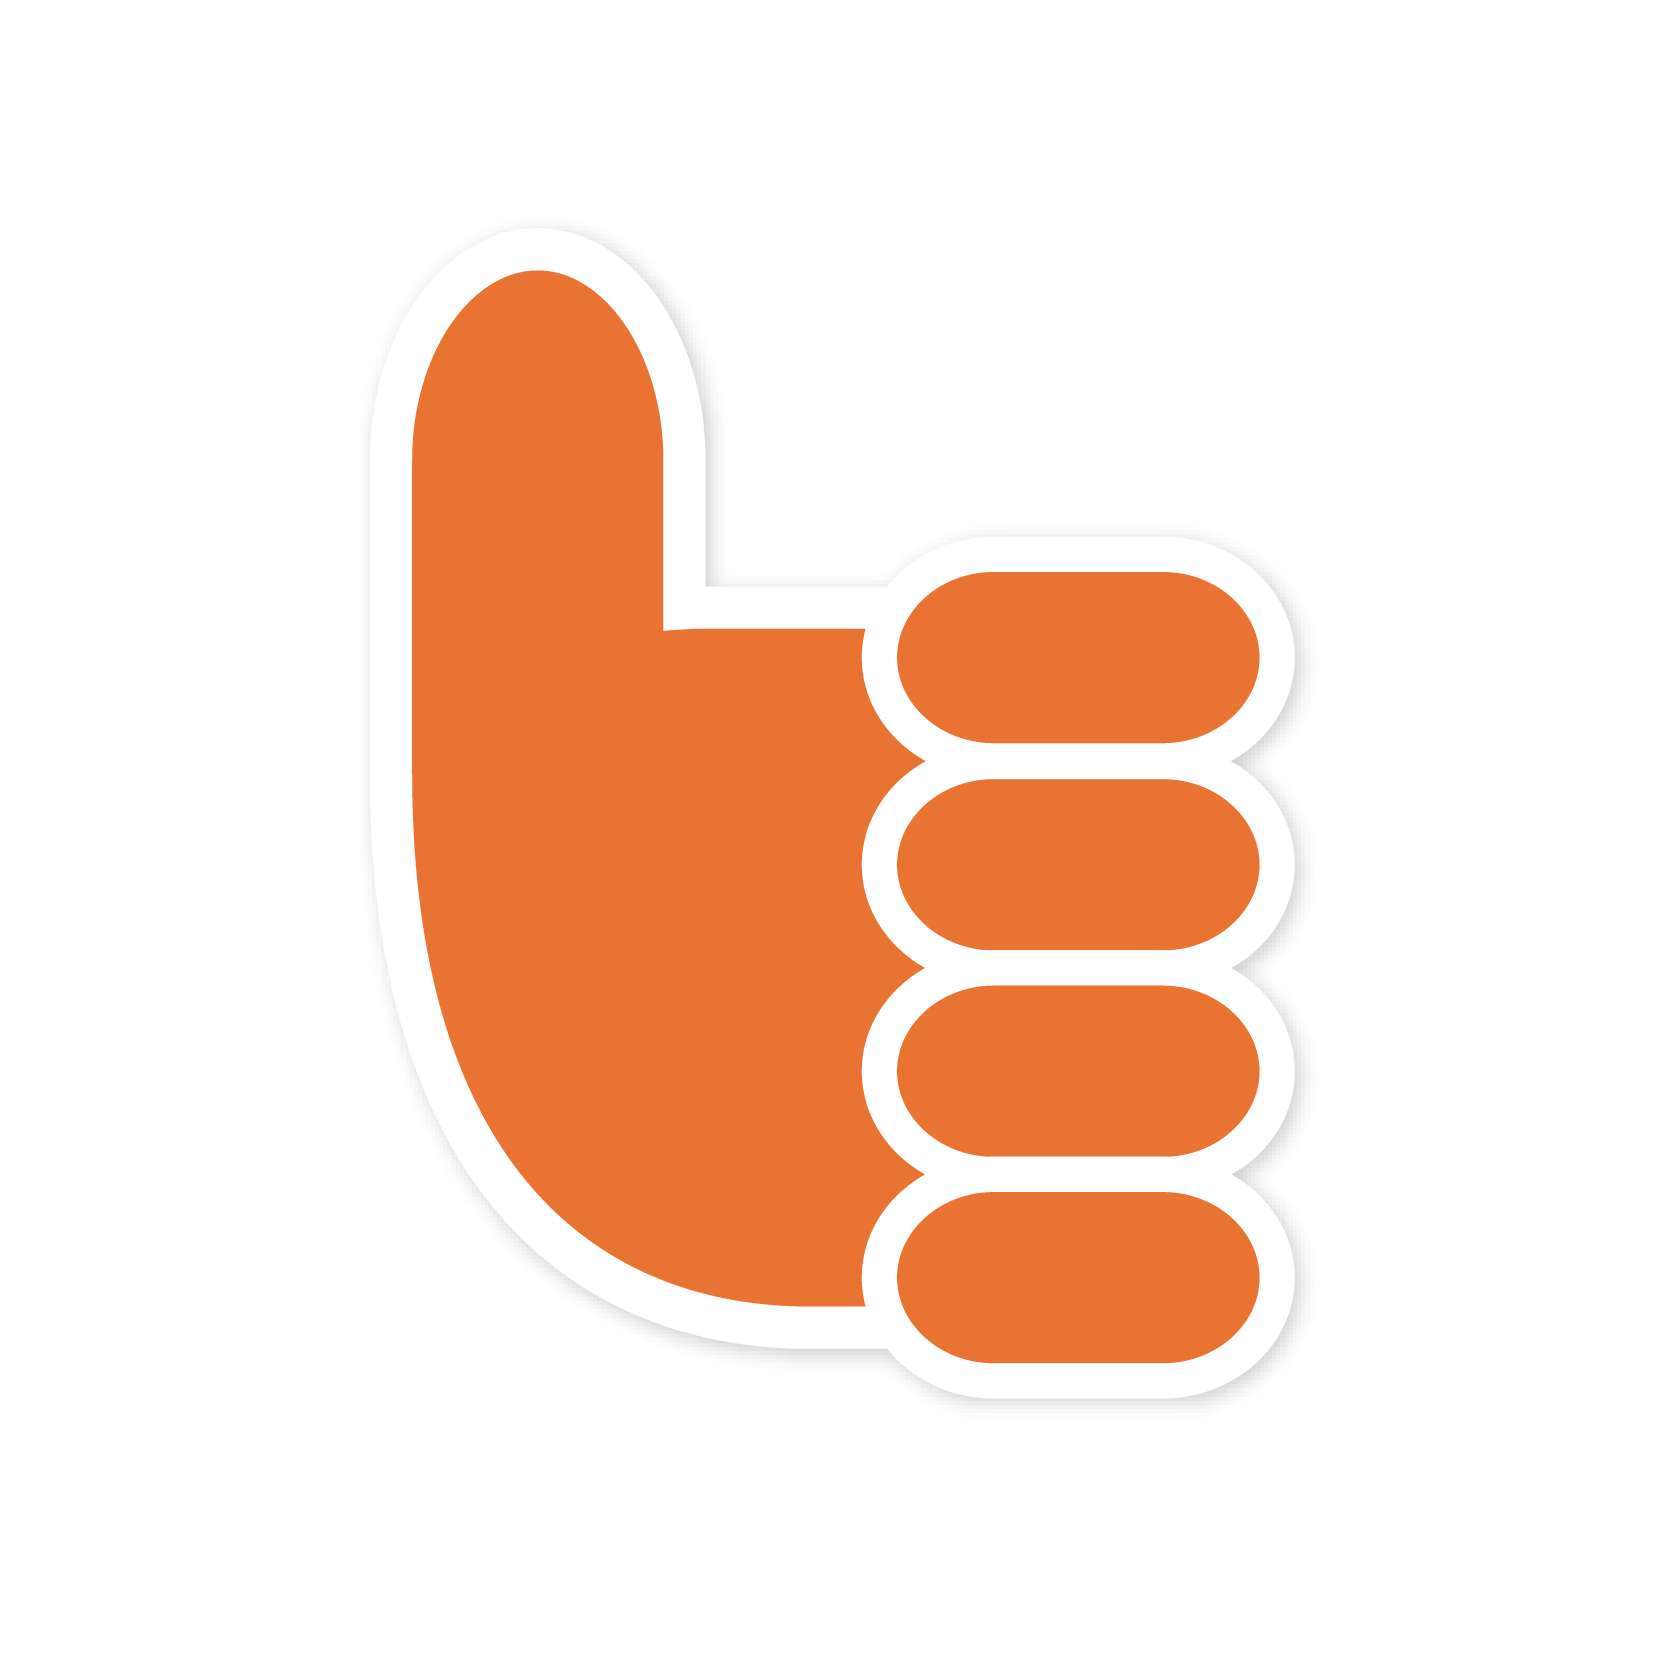 An orange thumbs up sticker